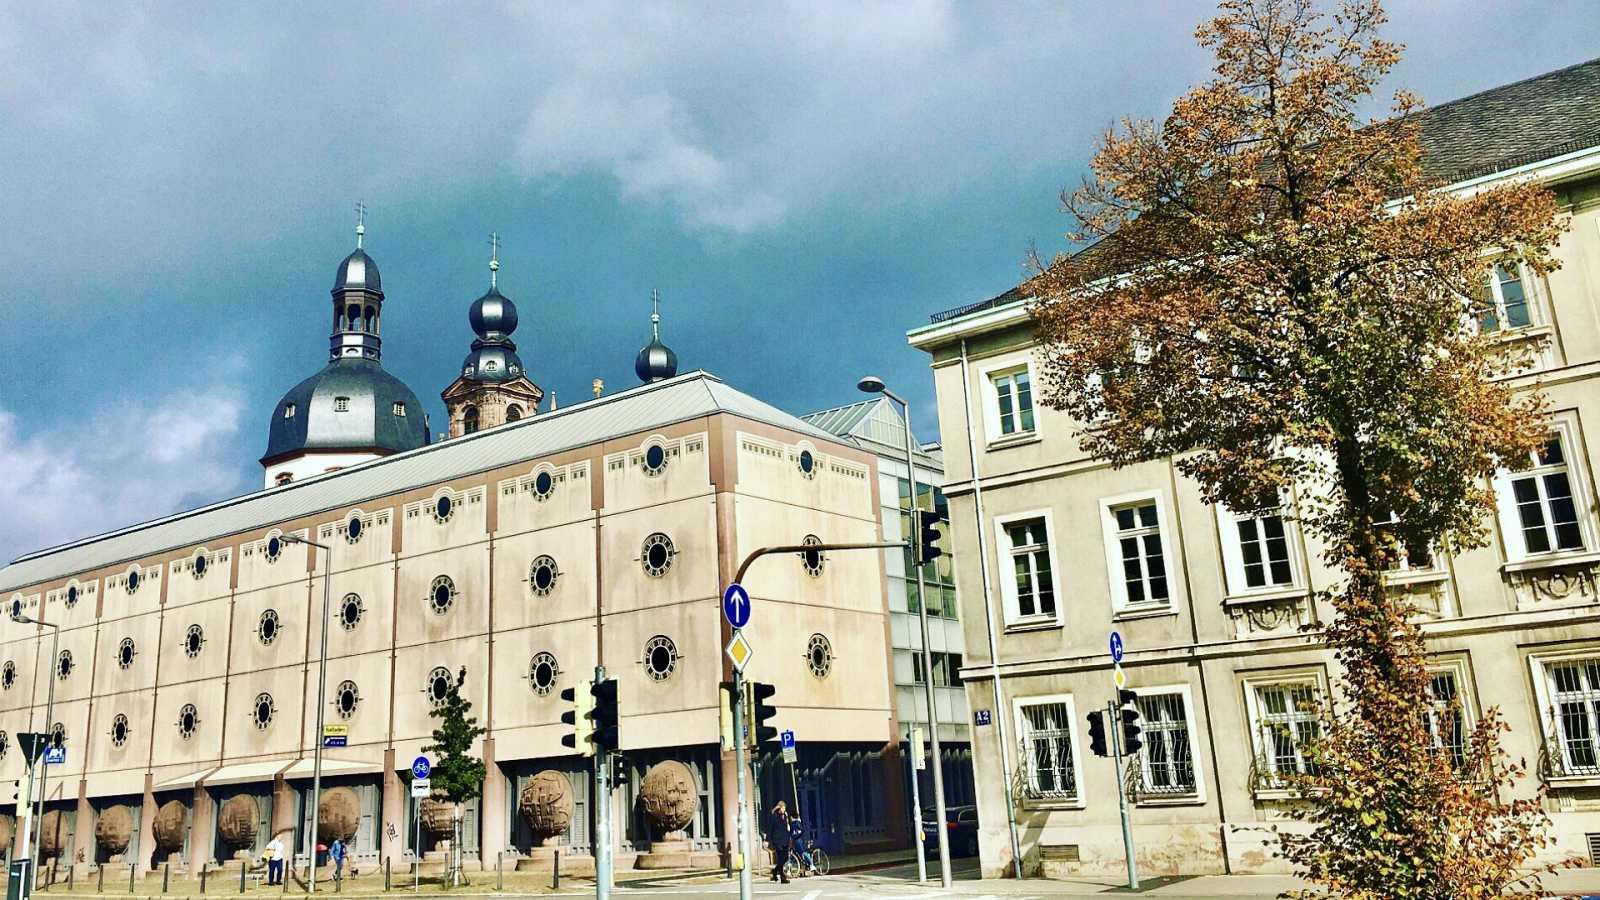 Global 5 - Mannheim, Alemania (III): Inicio de Wolfgang Amadeus Mozart - 24/11/20 - Escuchar ahora